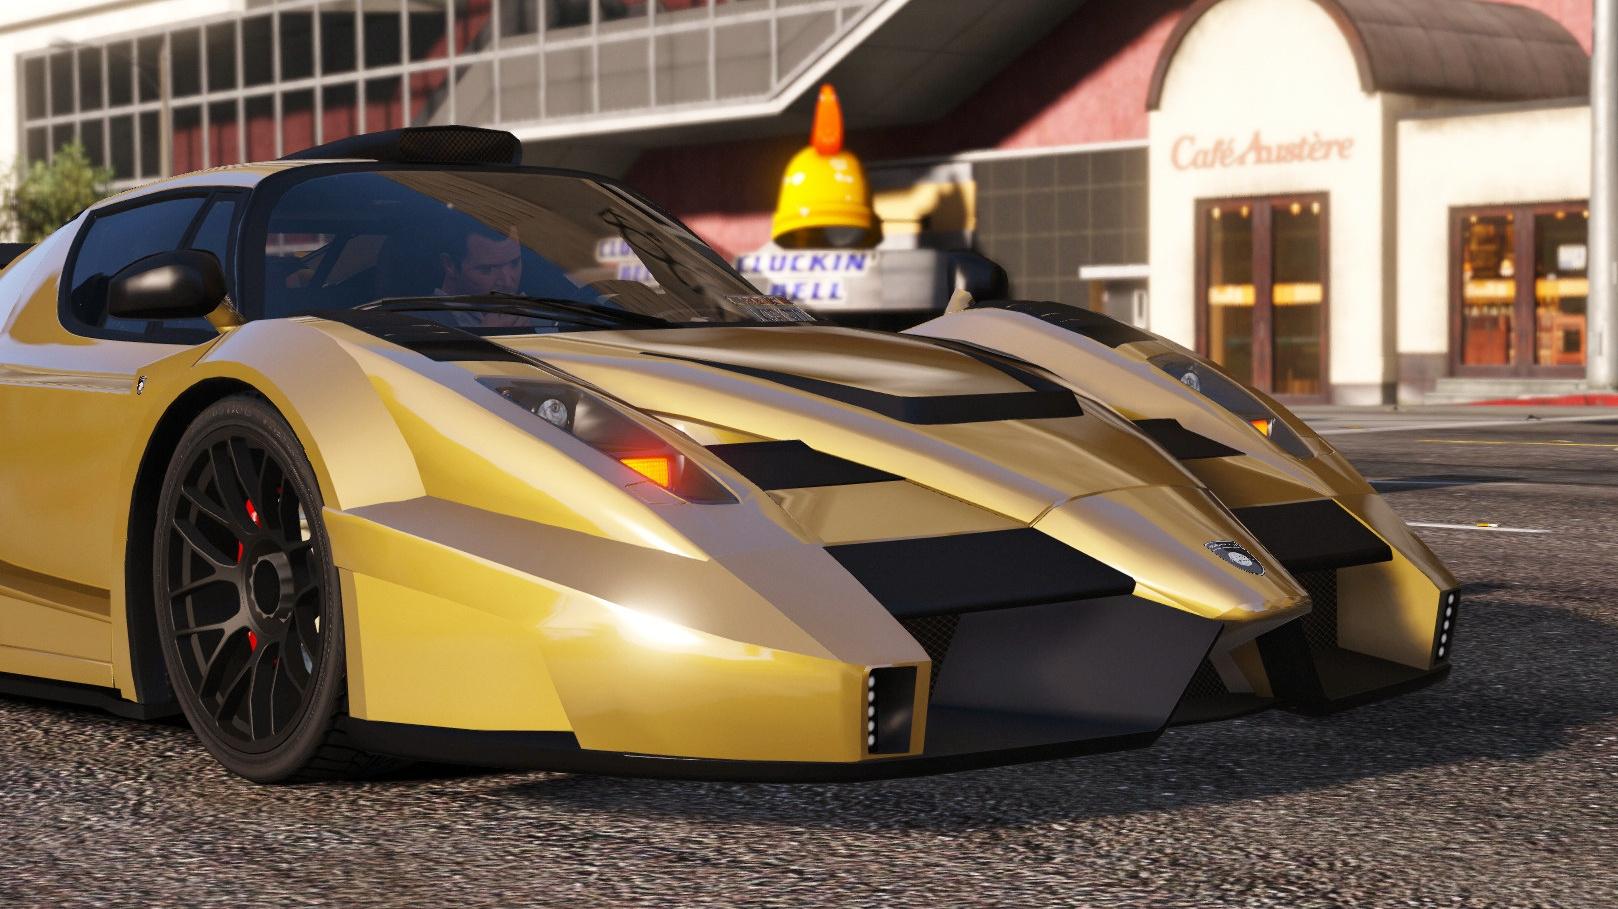 Ferrari Enzo & Gemballa MIG-U1 [Add-On   Tuning] - GTA5-Mods.com